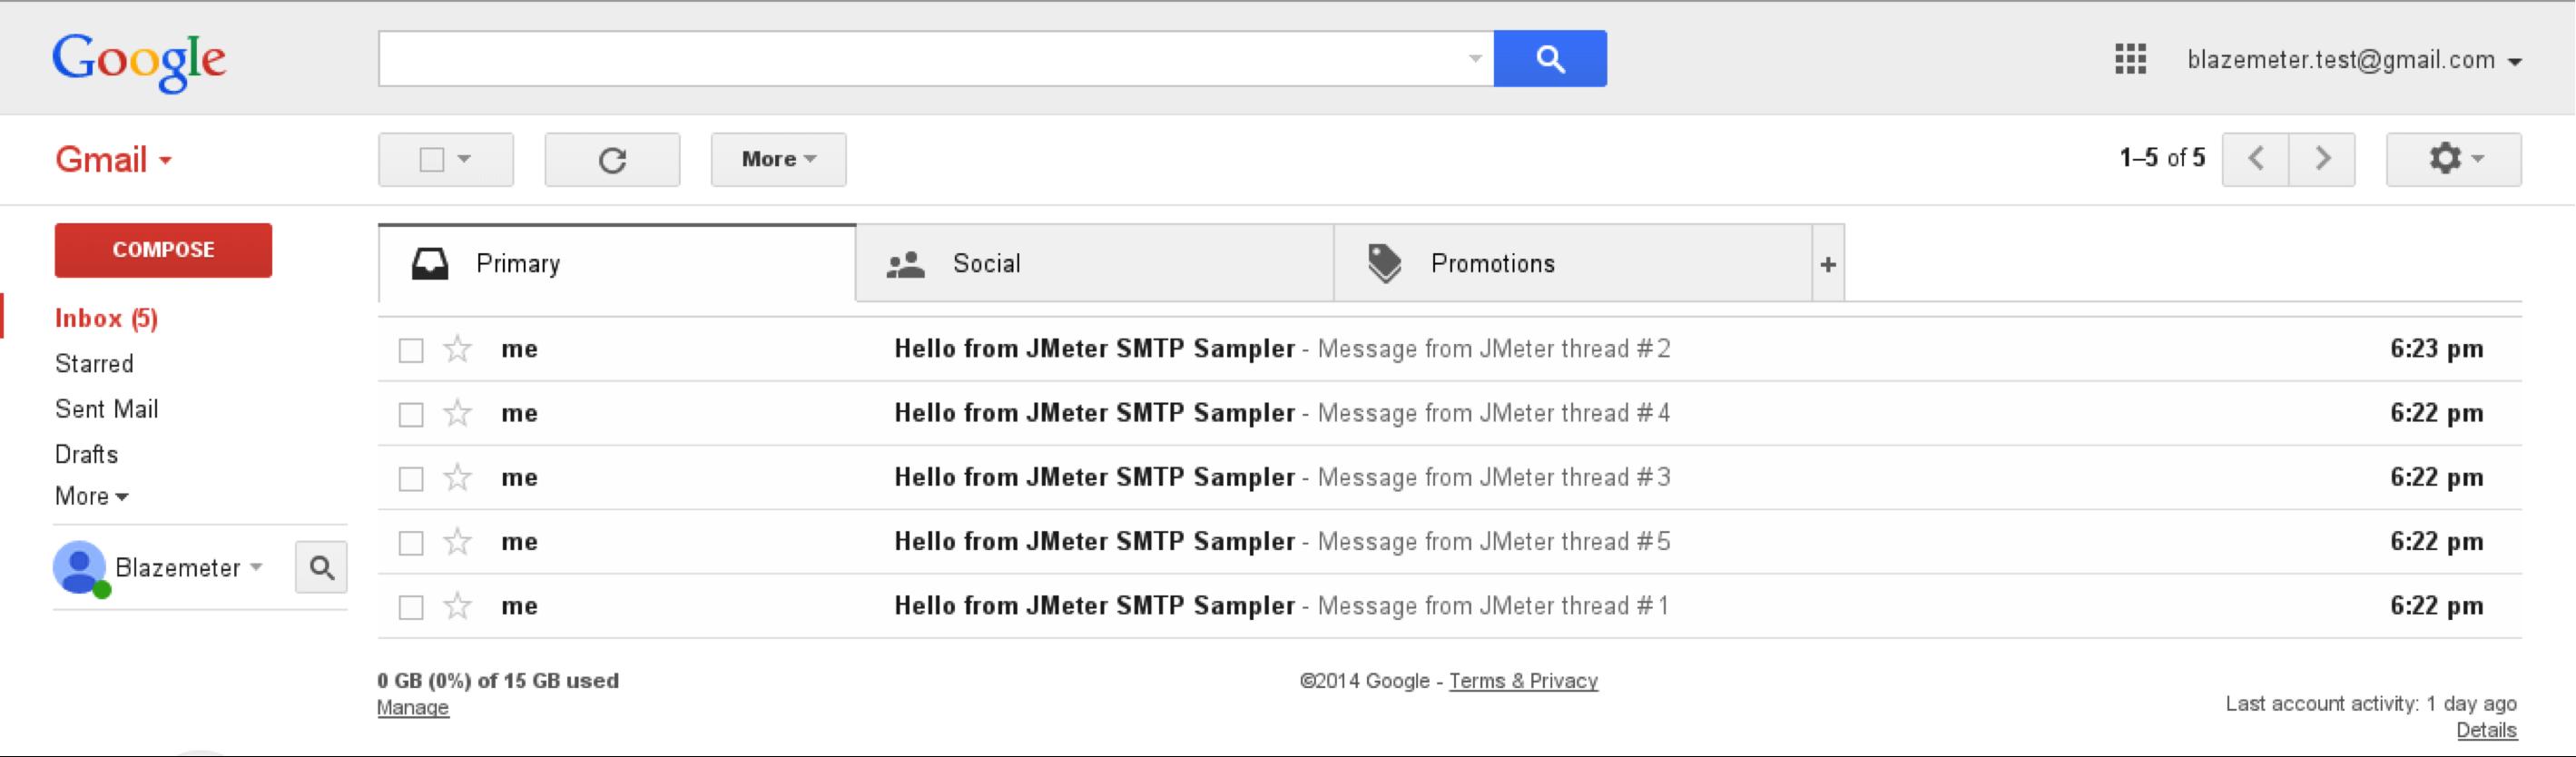 Программа для массовой email рассылки  </tbody></table> </td> </tr> </tbody></table>  <table bgcolor=